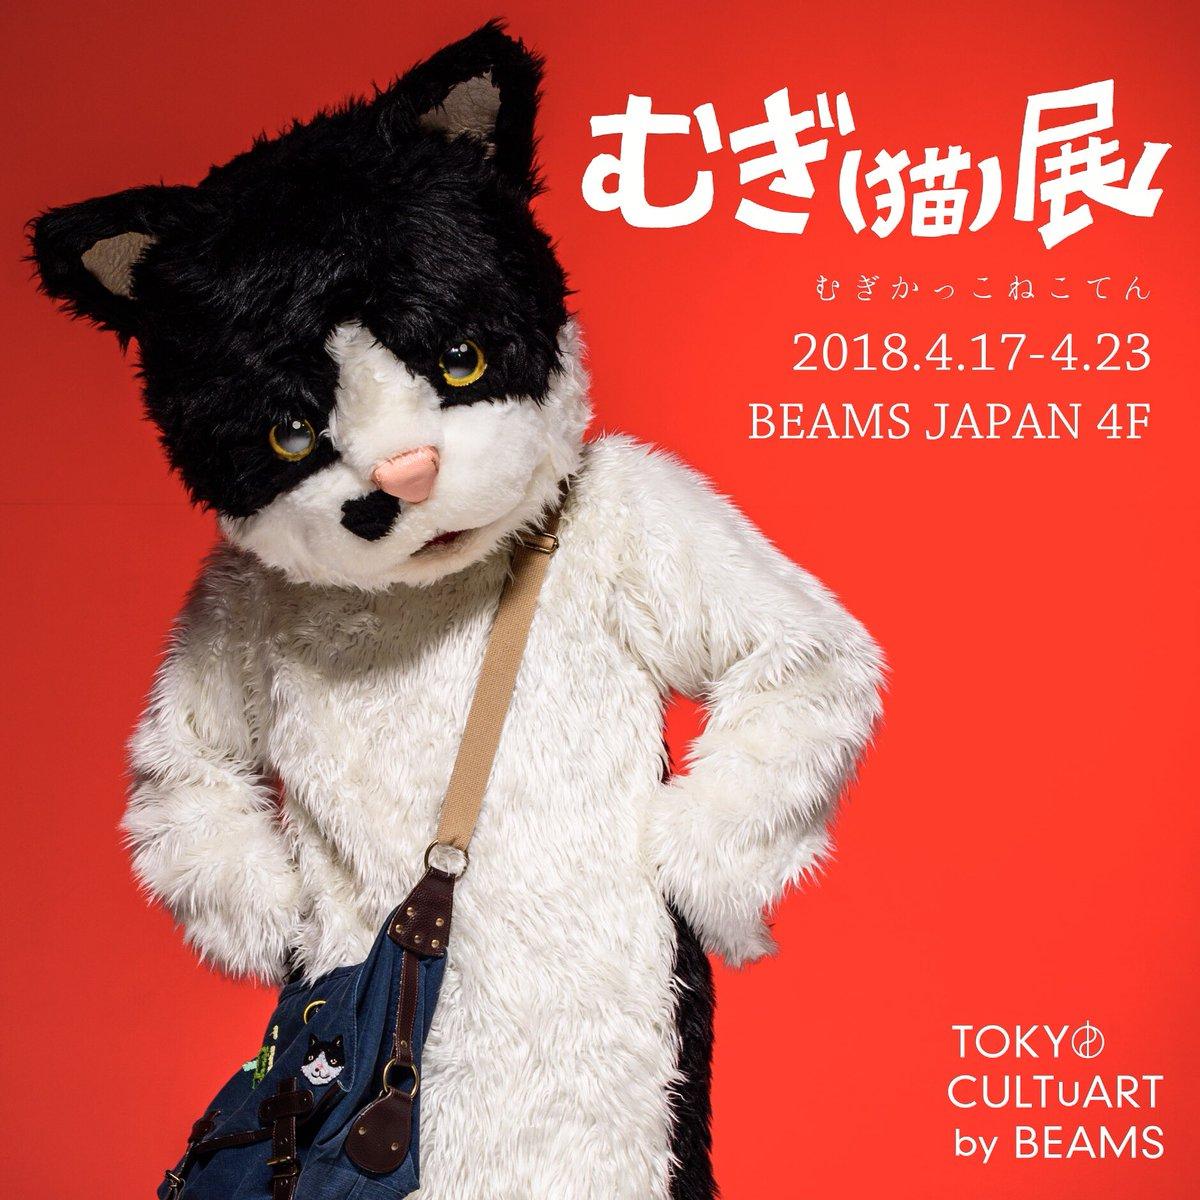 「麦猫」の画像検索結果